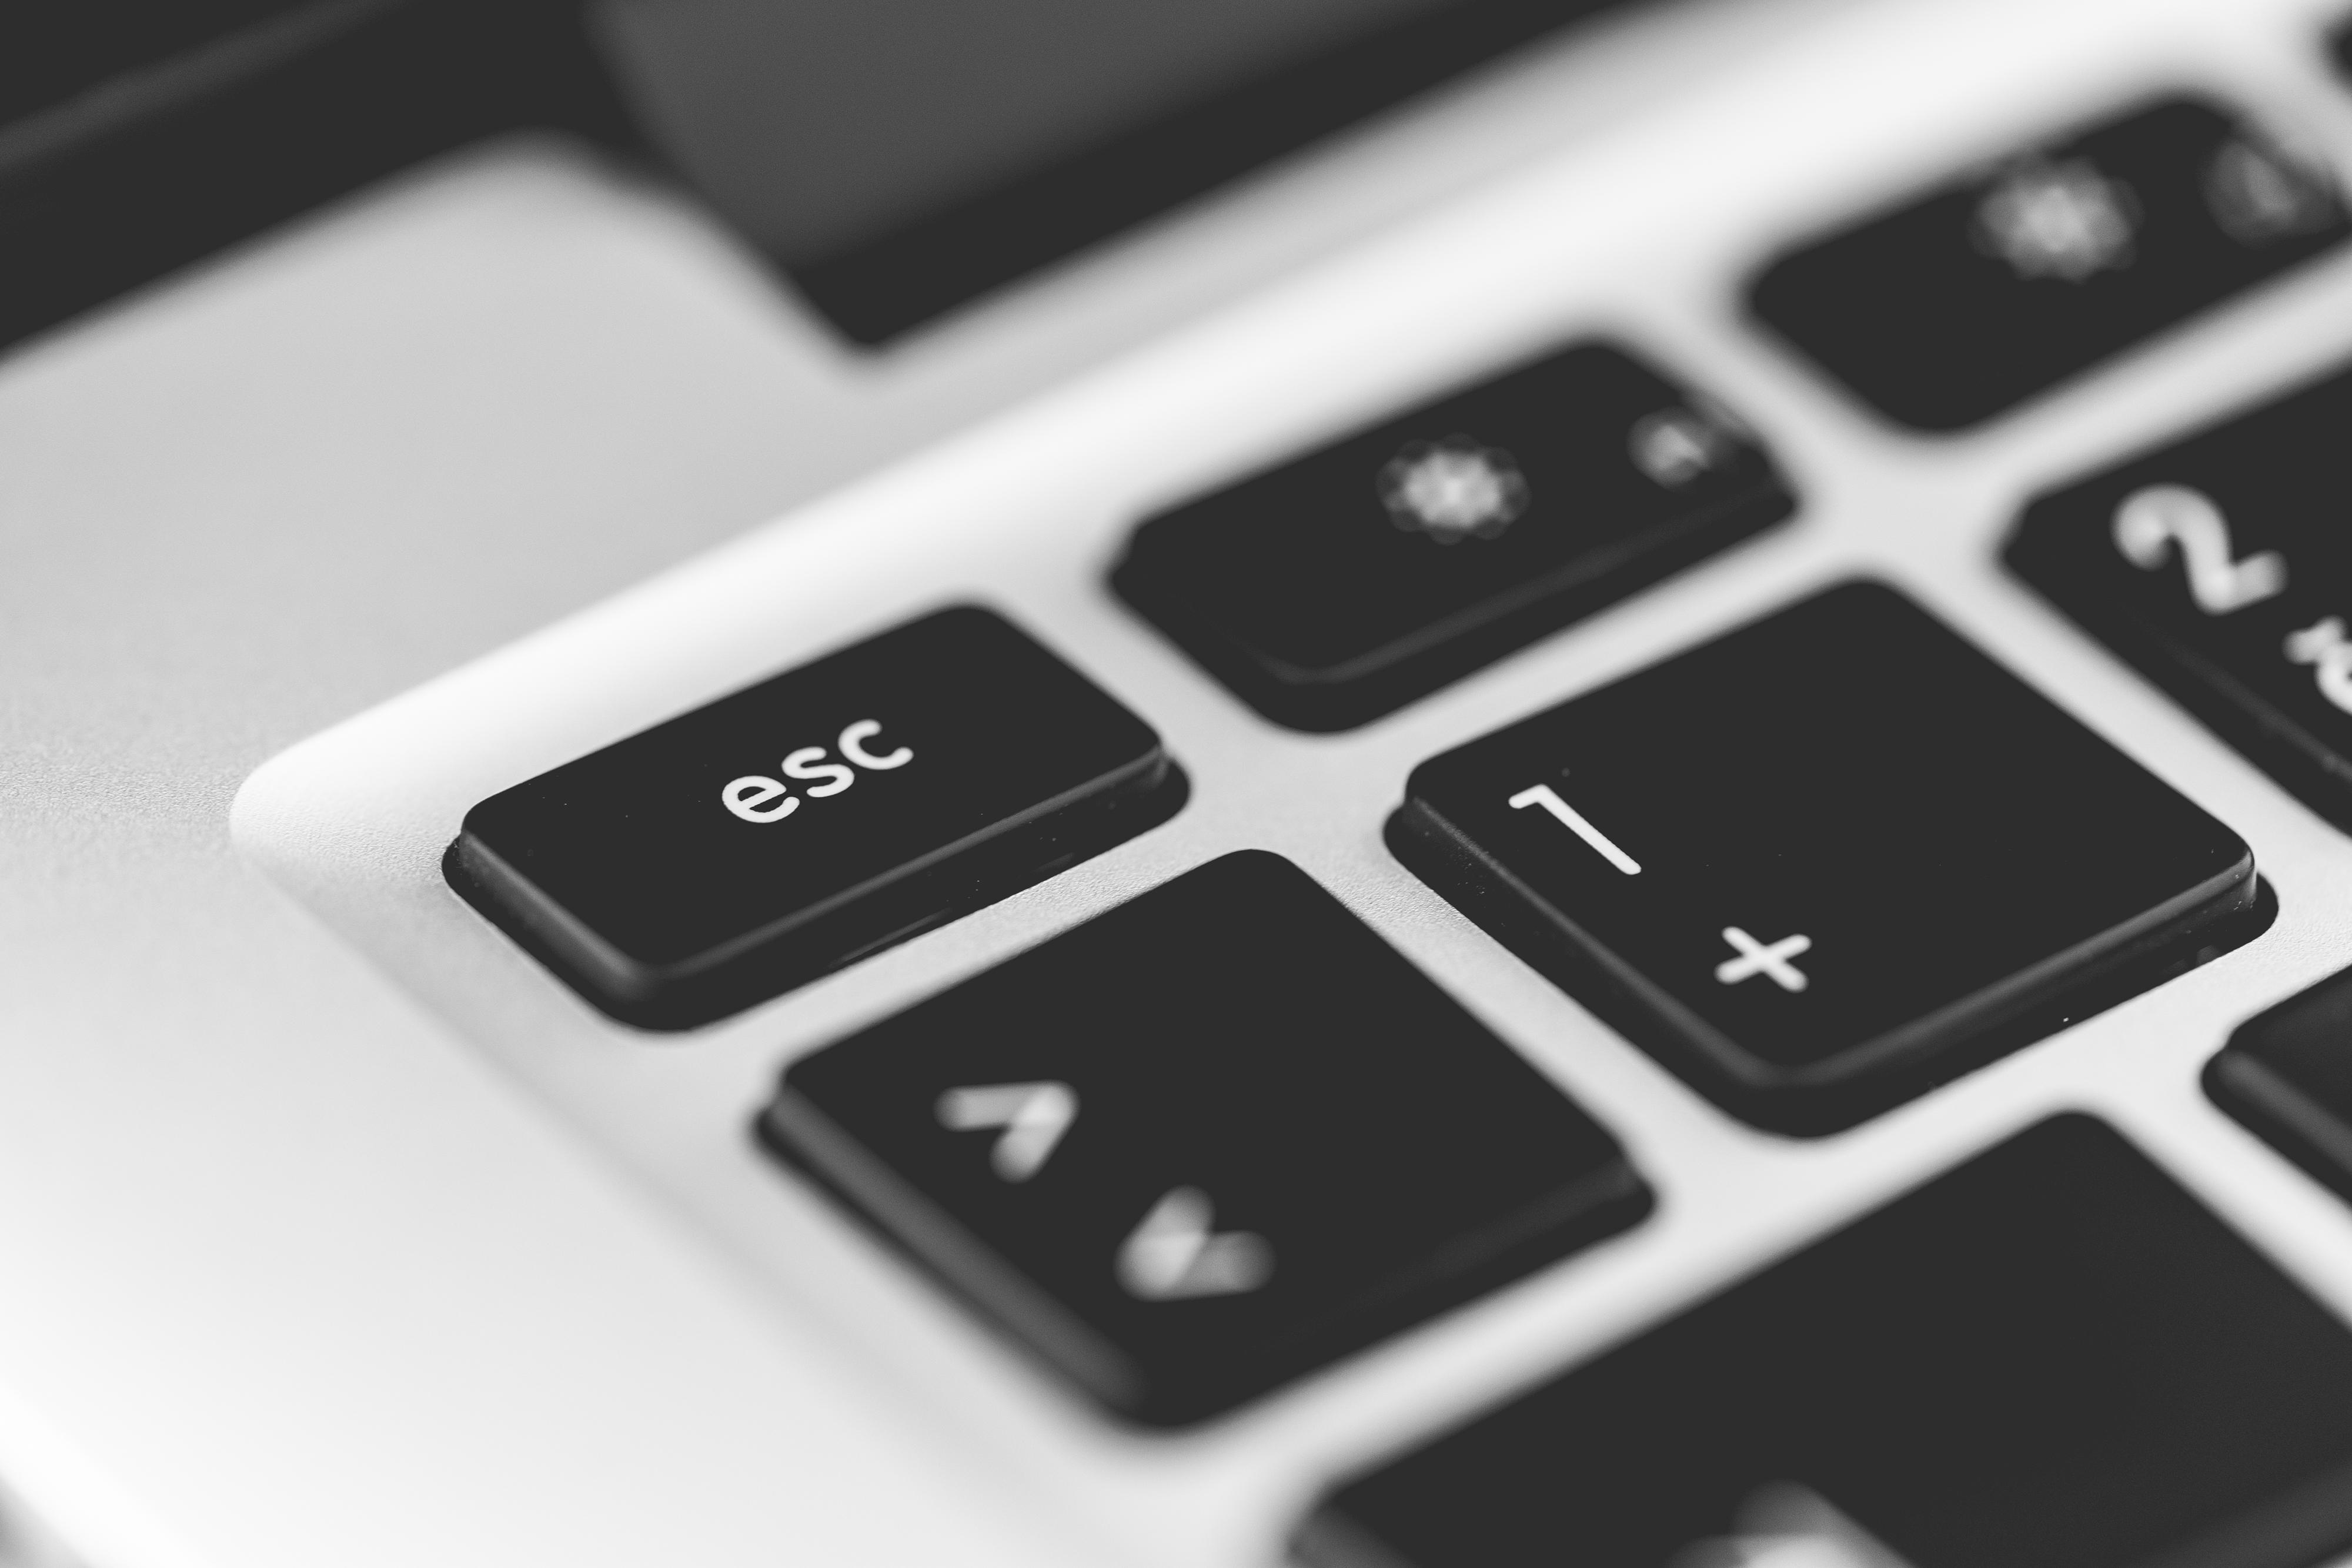 escape-key-laptop-keyboard-close-up-picjumbo-com (3)